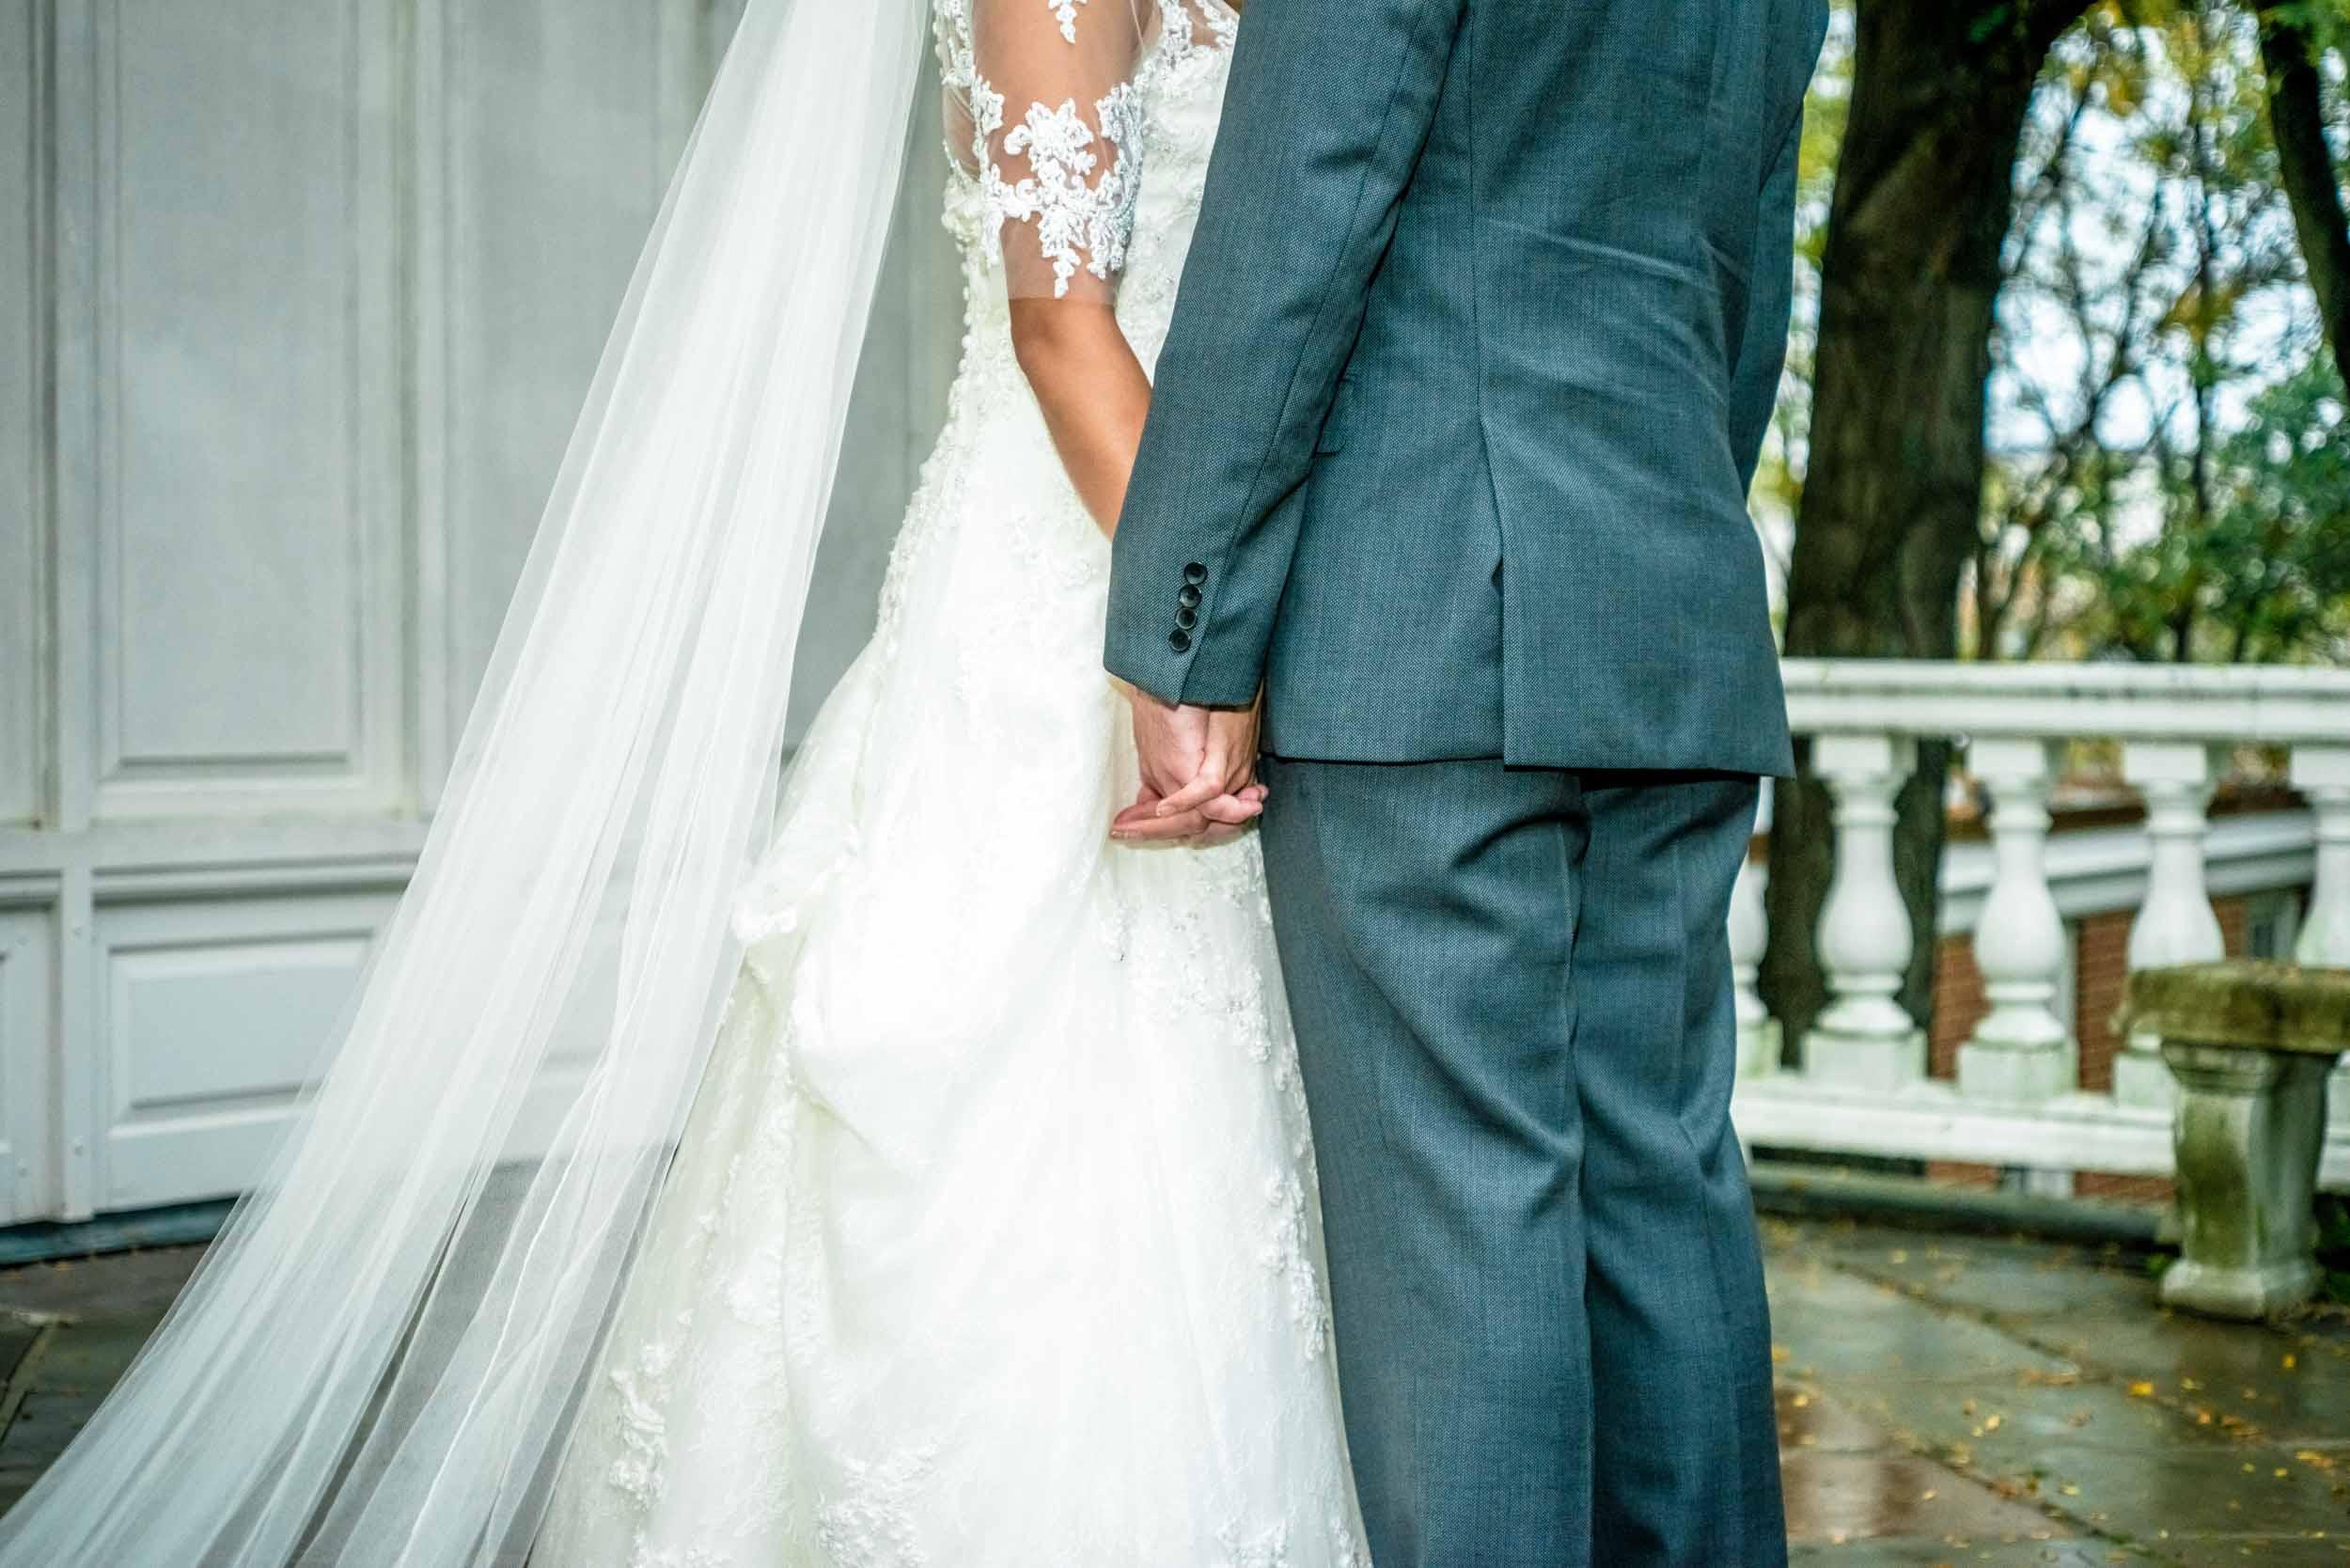 dc+metro+wedding+photographer+vadym+guliuk+photography+wedding+bride+and+groom-2046.jpg